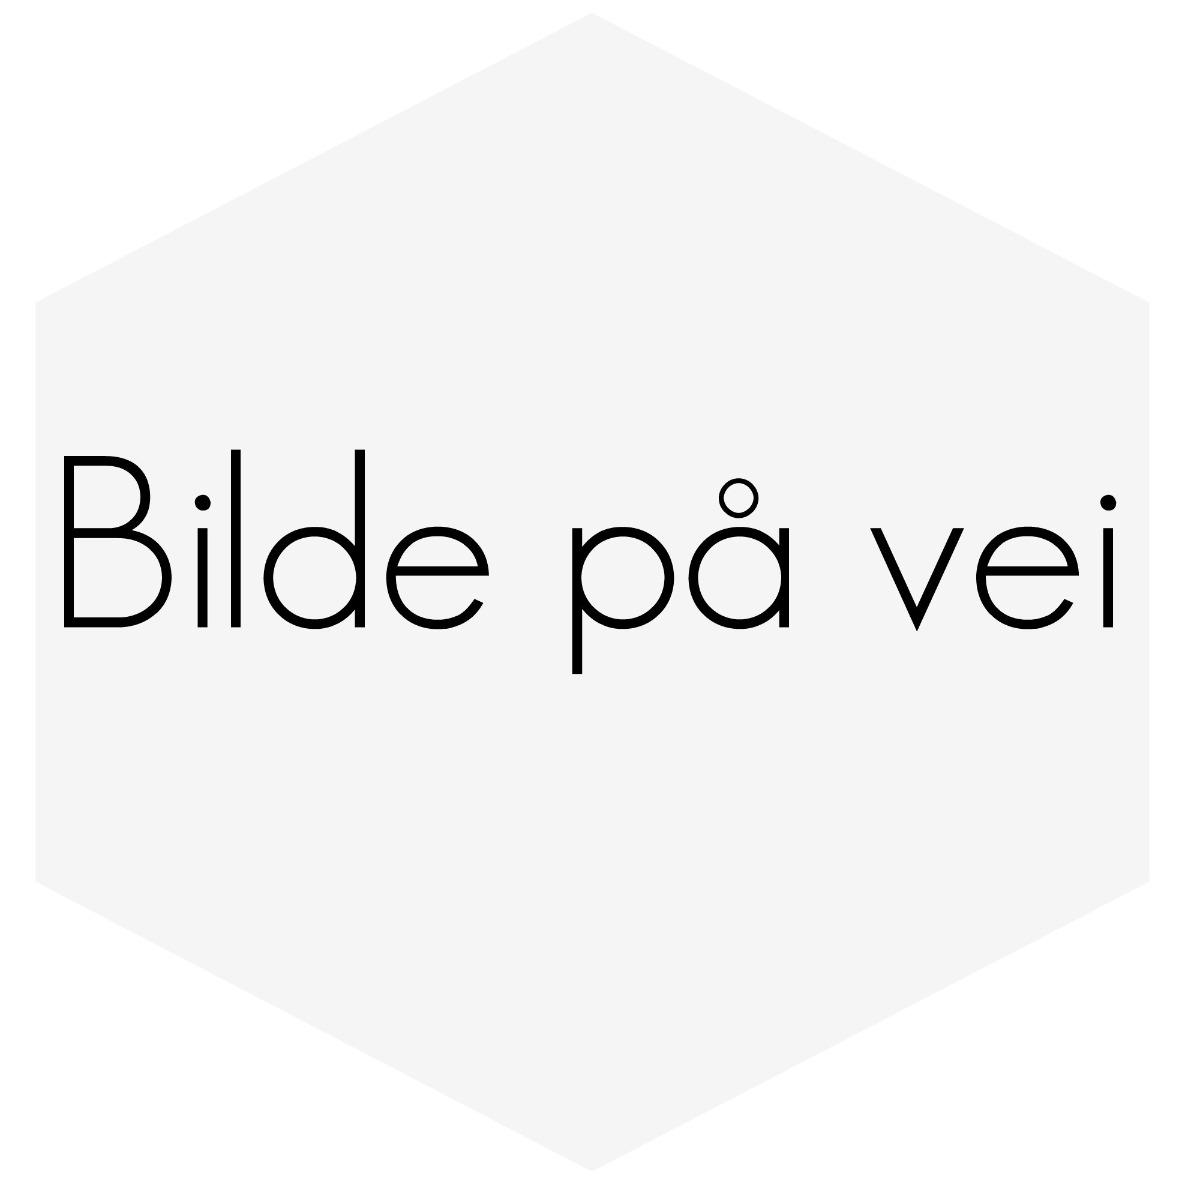 STAG FOR AVSTIVNING KAROSSERI PÅ VOLVO 700/900 IPD